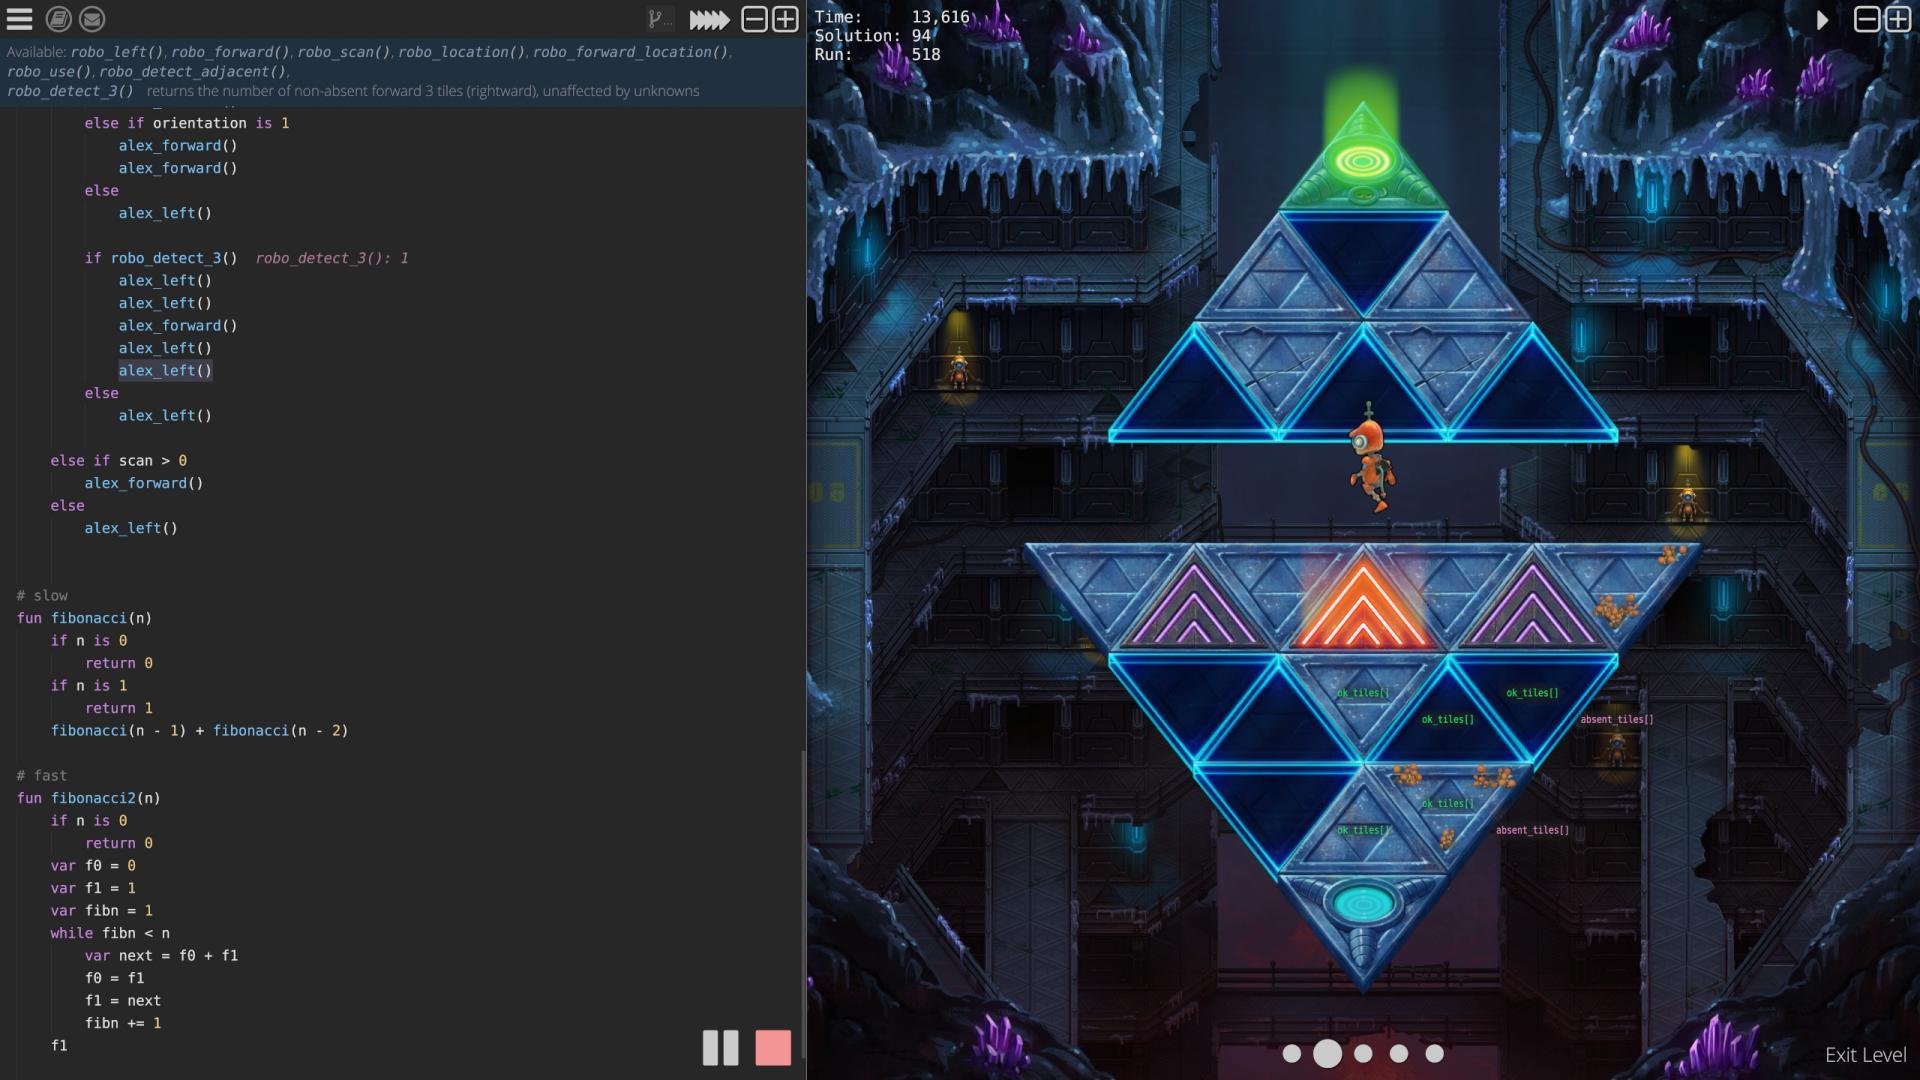 Robo Instructus gameplay screenshot with full UI